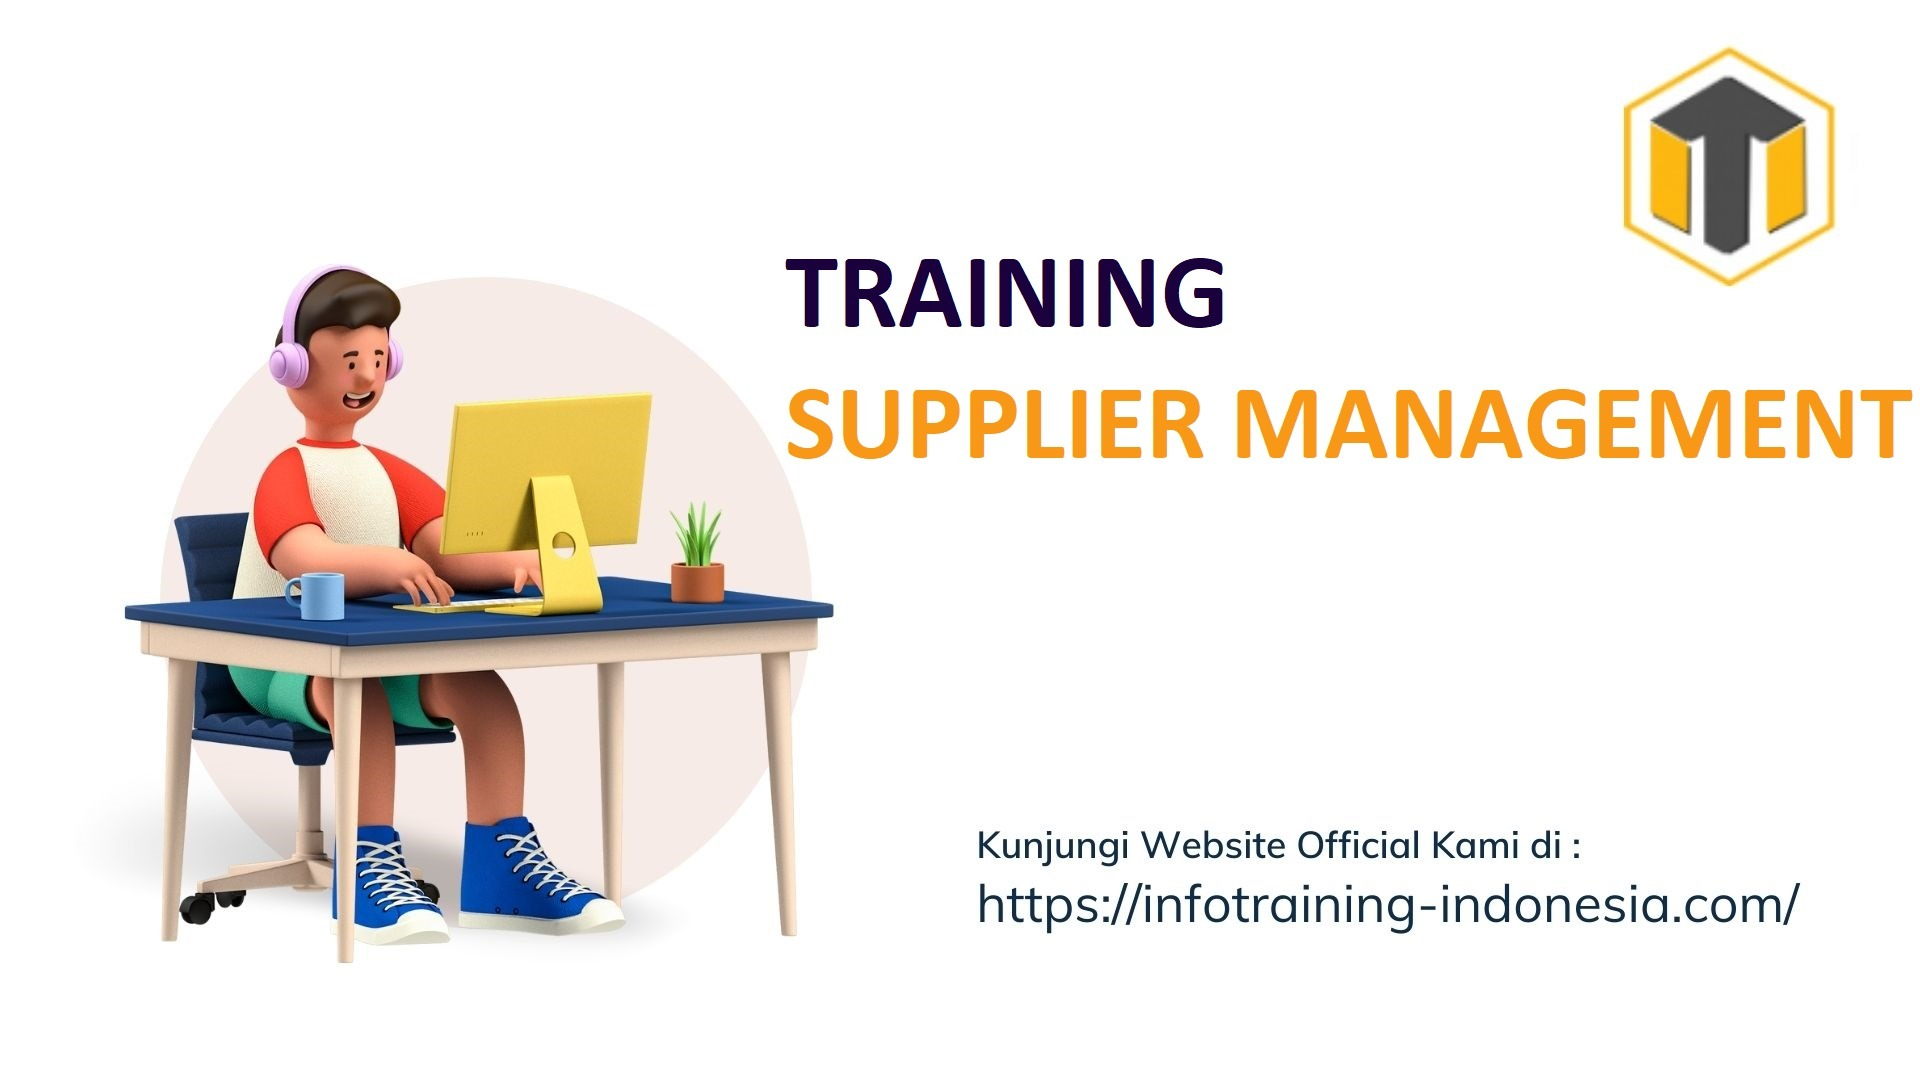 TRAINING SUPPLIER MANAGEMENT Manajemen